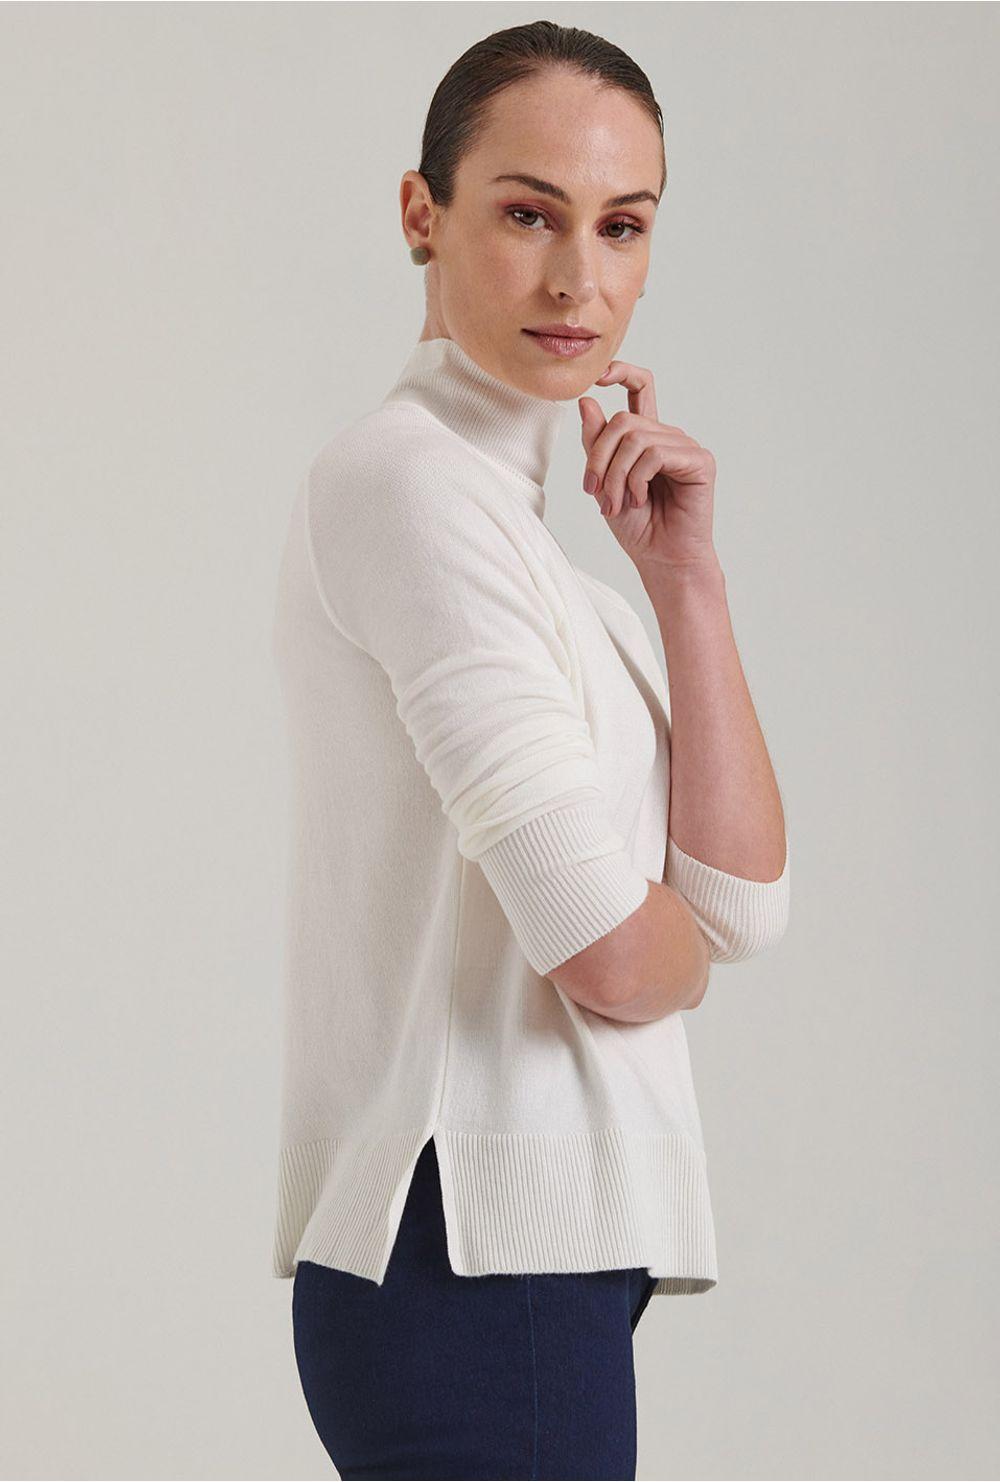 Blusa Em Tricot Matera Gola Alta Off White Mobile